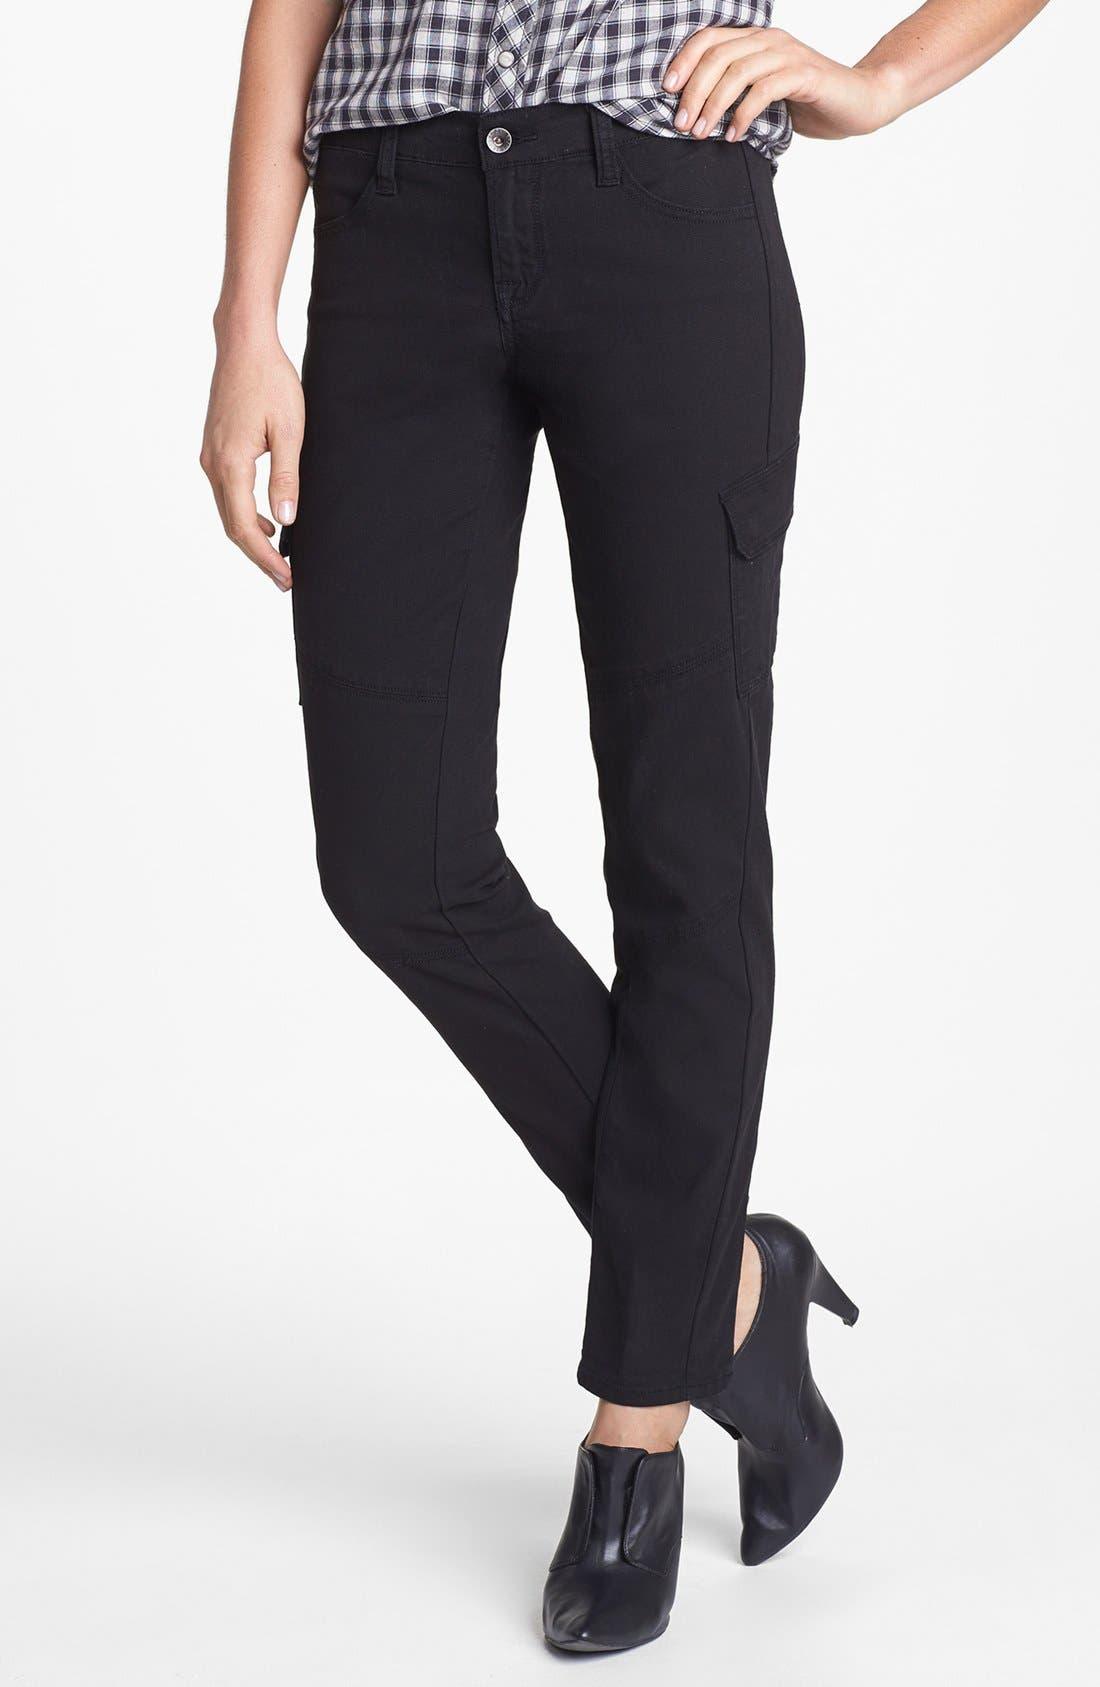 Alternate Image 1 Selected - Lucky Brand Skinny Cargo Pants